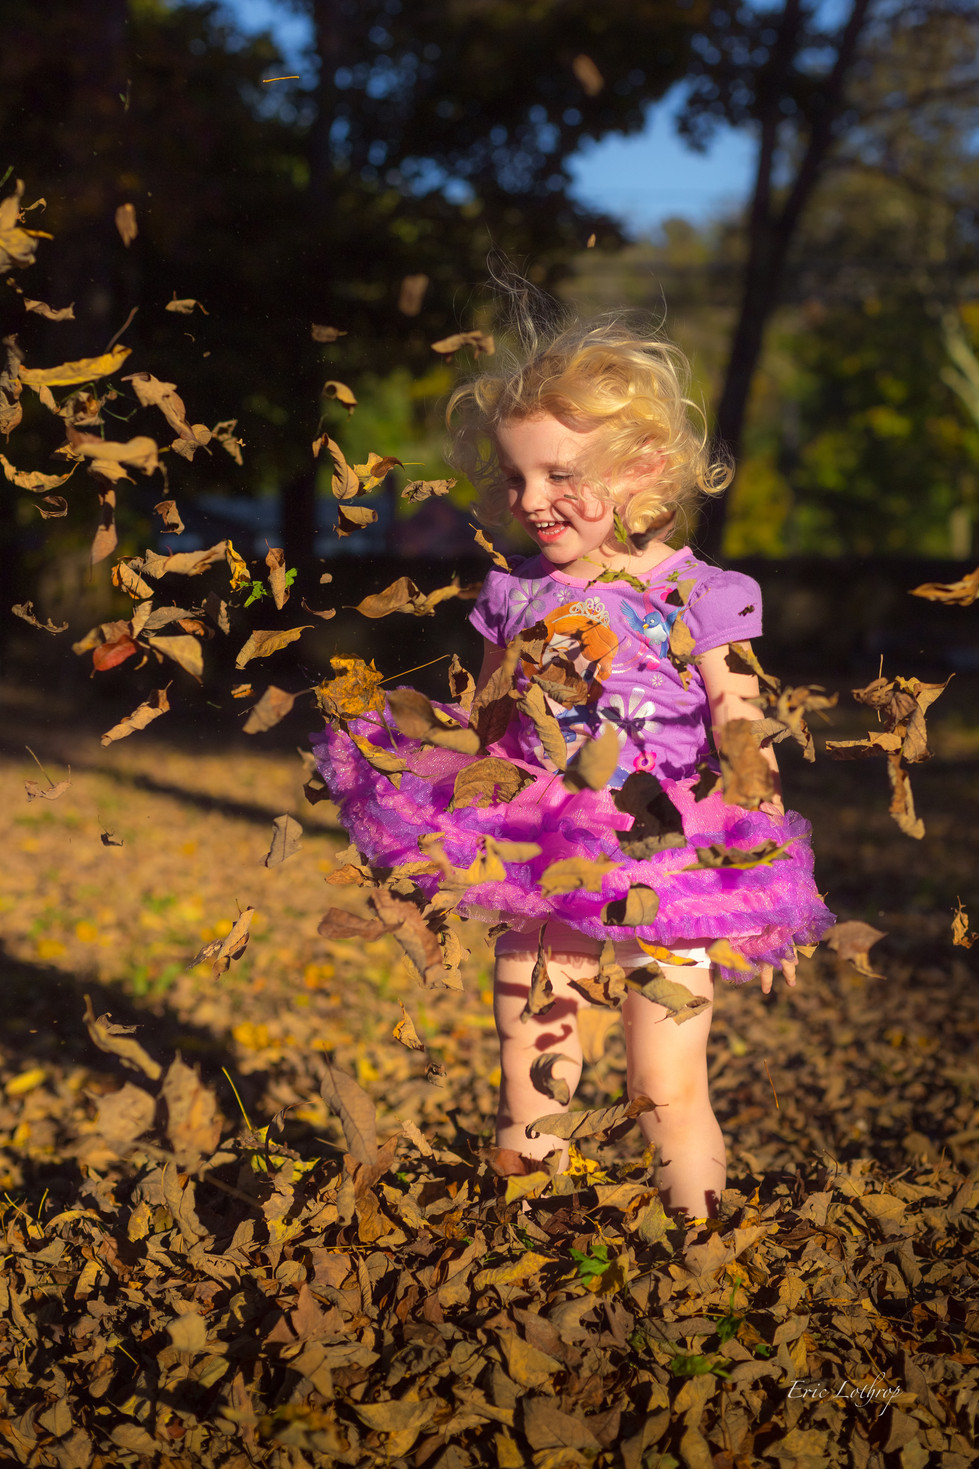 Autumn Always.jpg